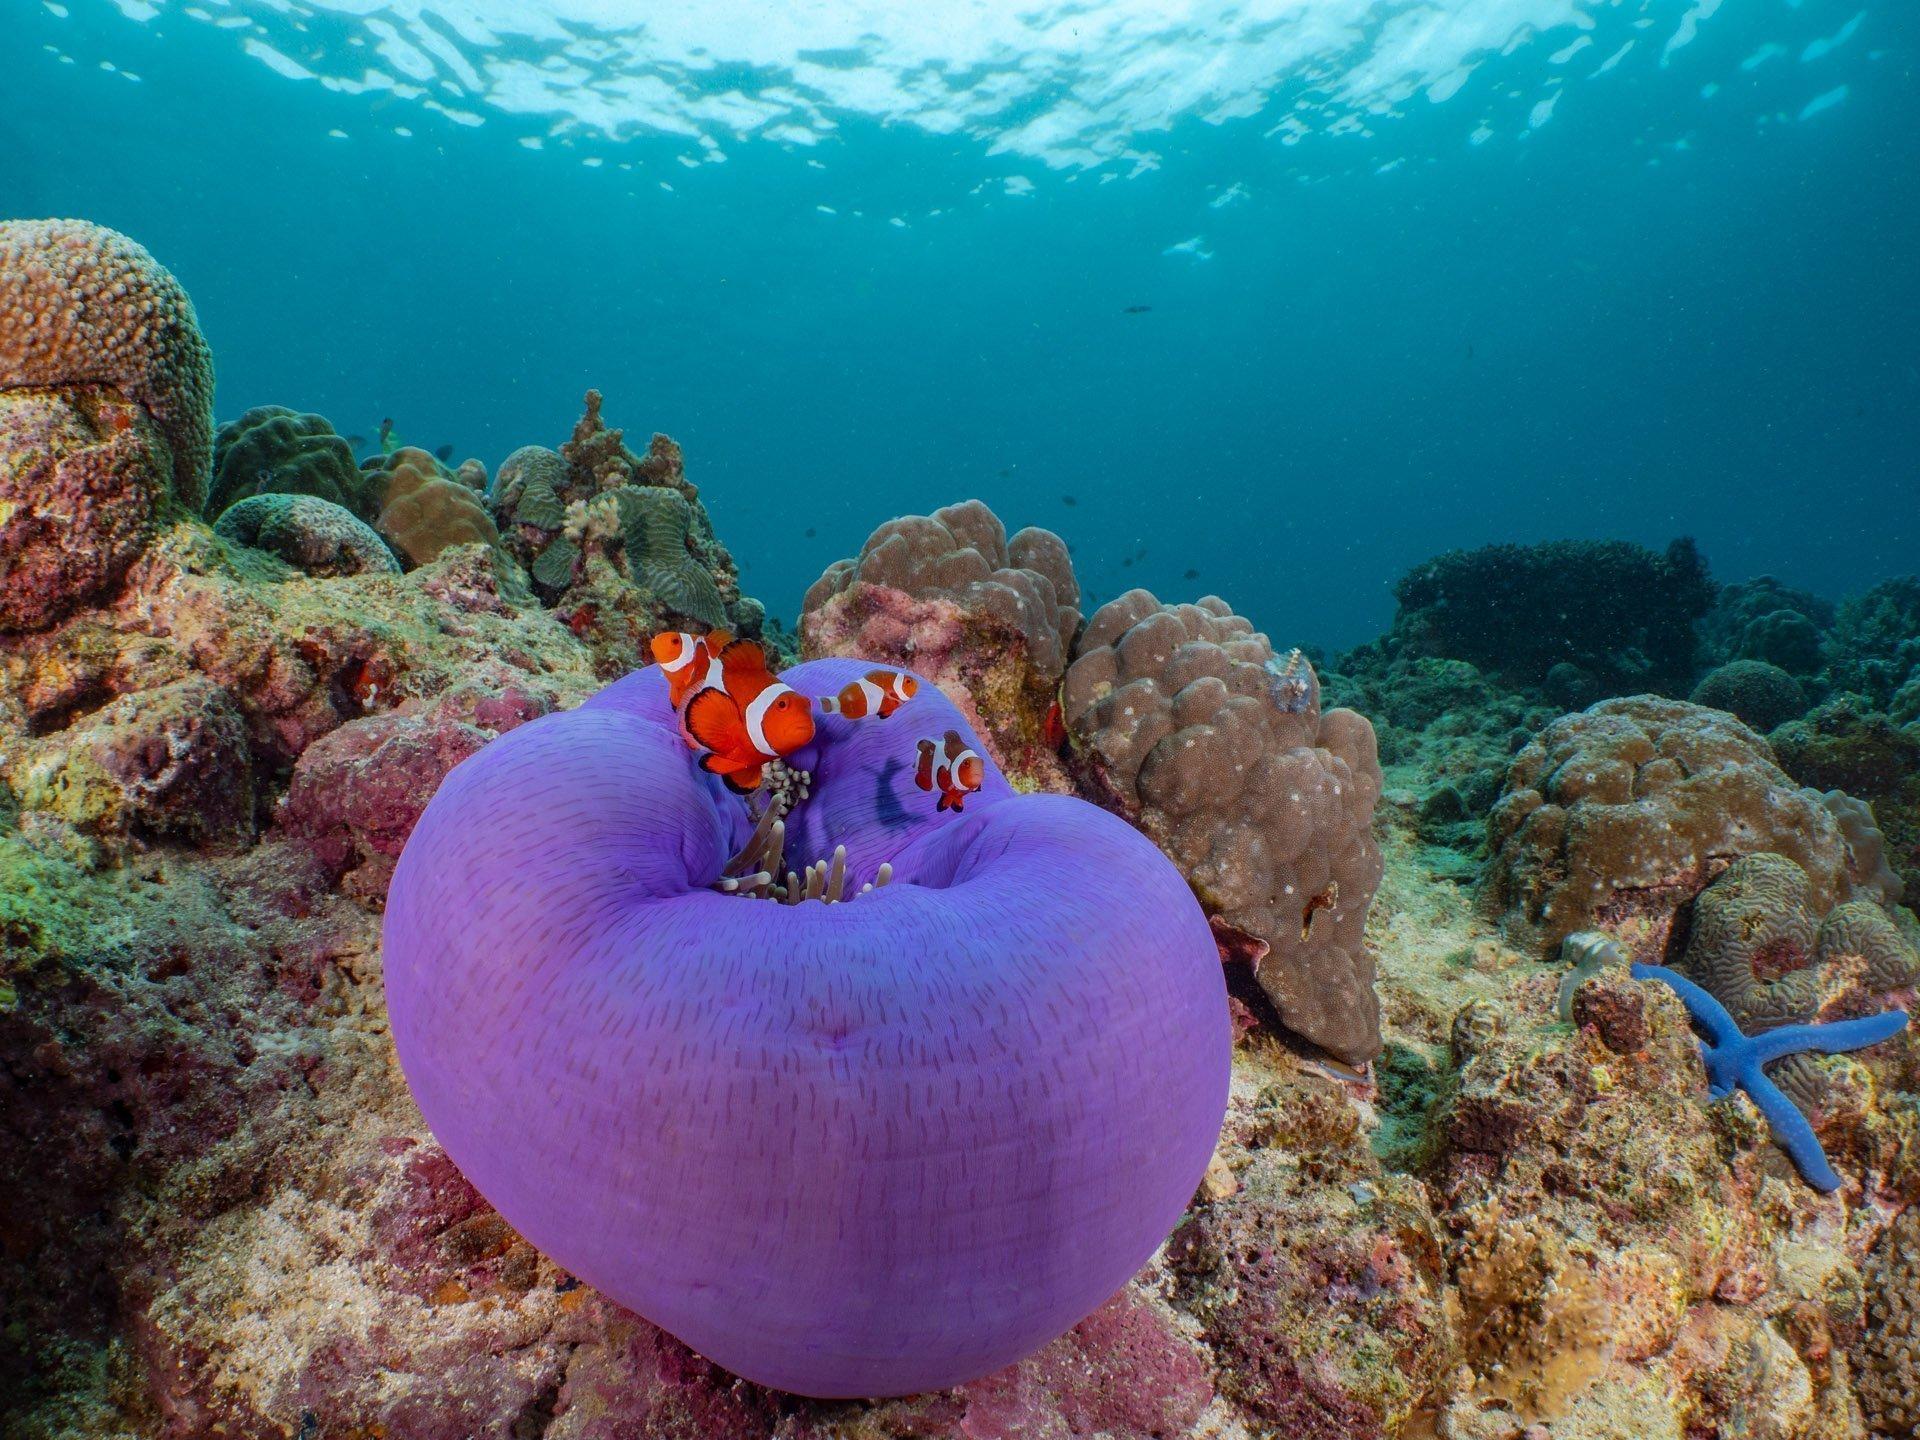 Anemone fish in purple anemone